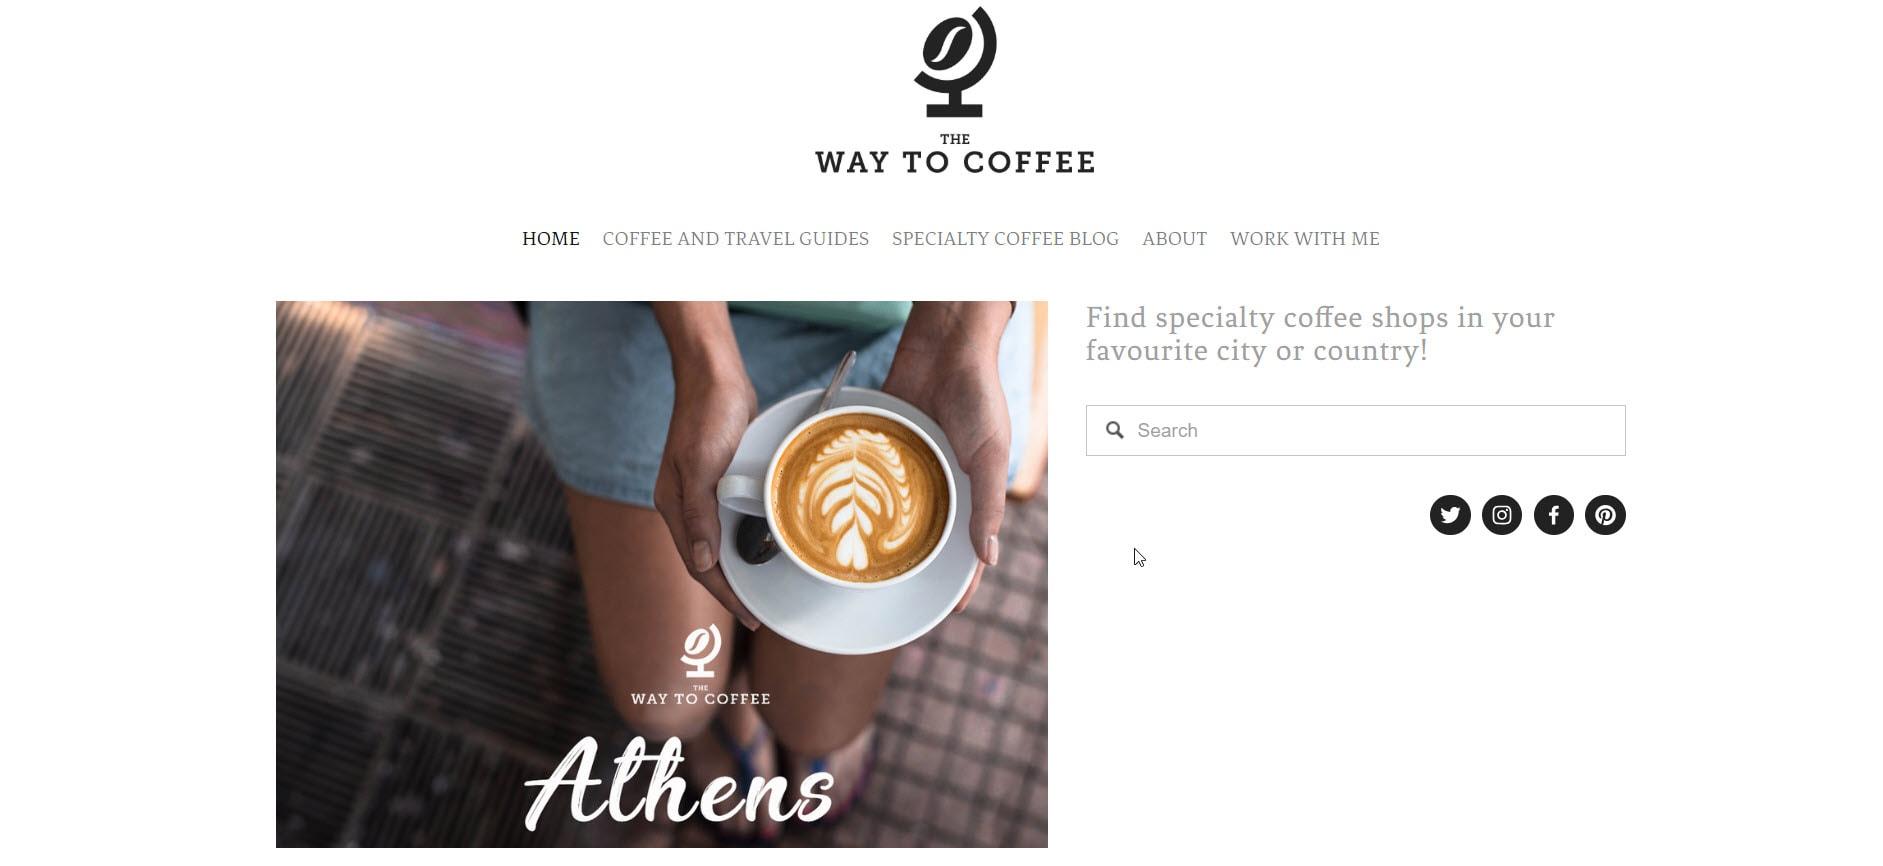 The Way To Coffee Blog